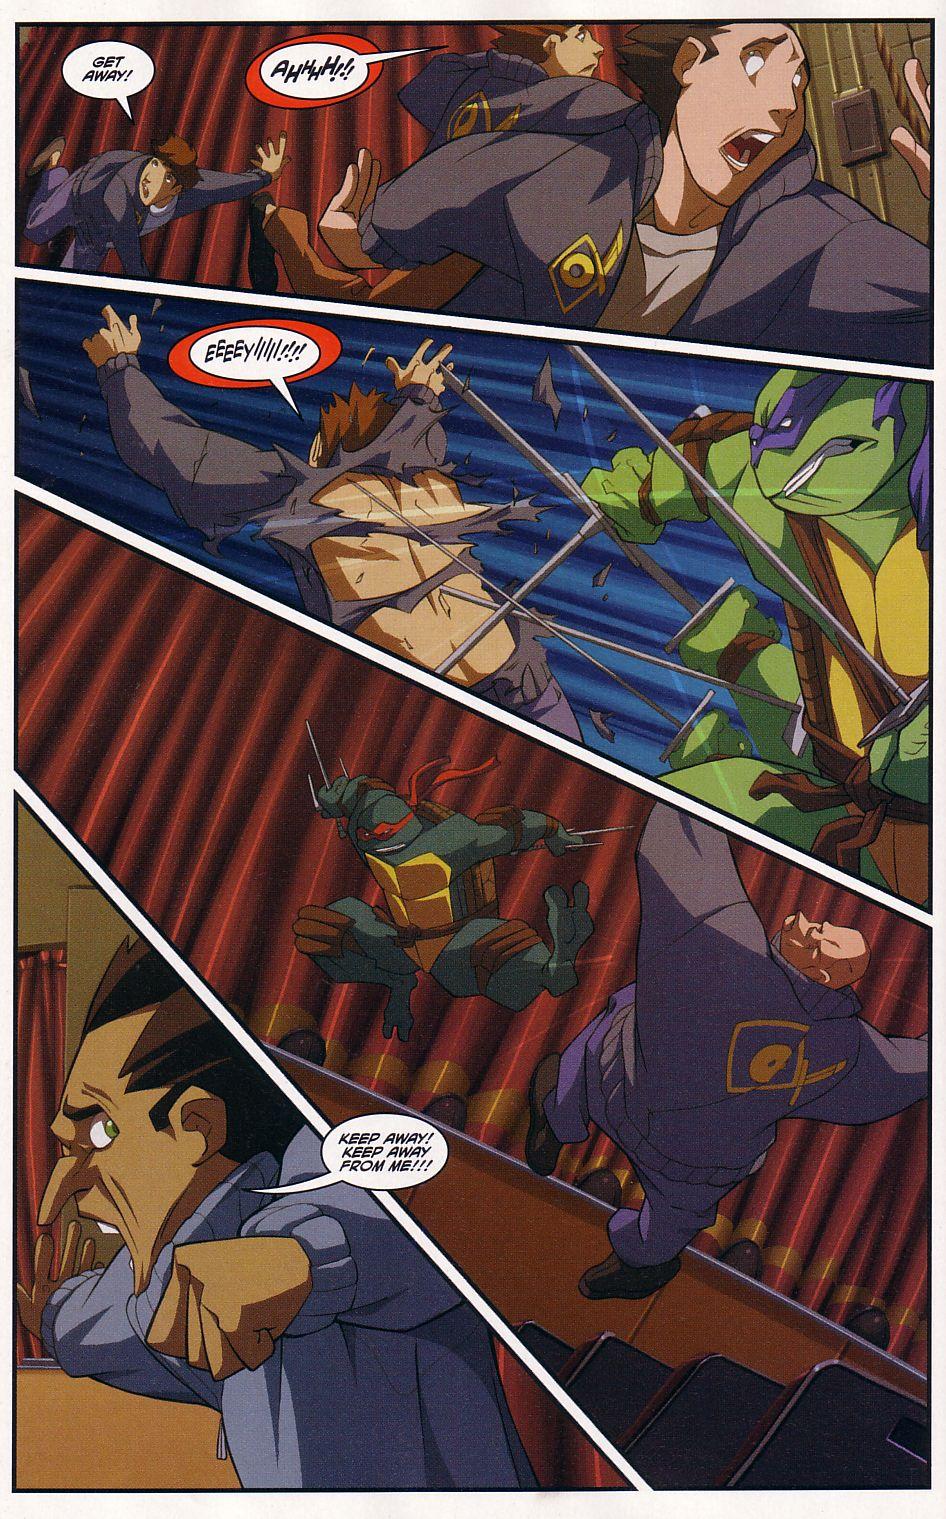 Teenage Mutant Ninja Turtles (2003) chap 7 pic 22